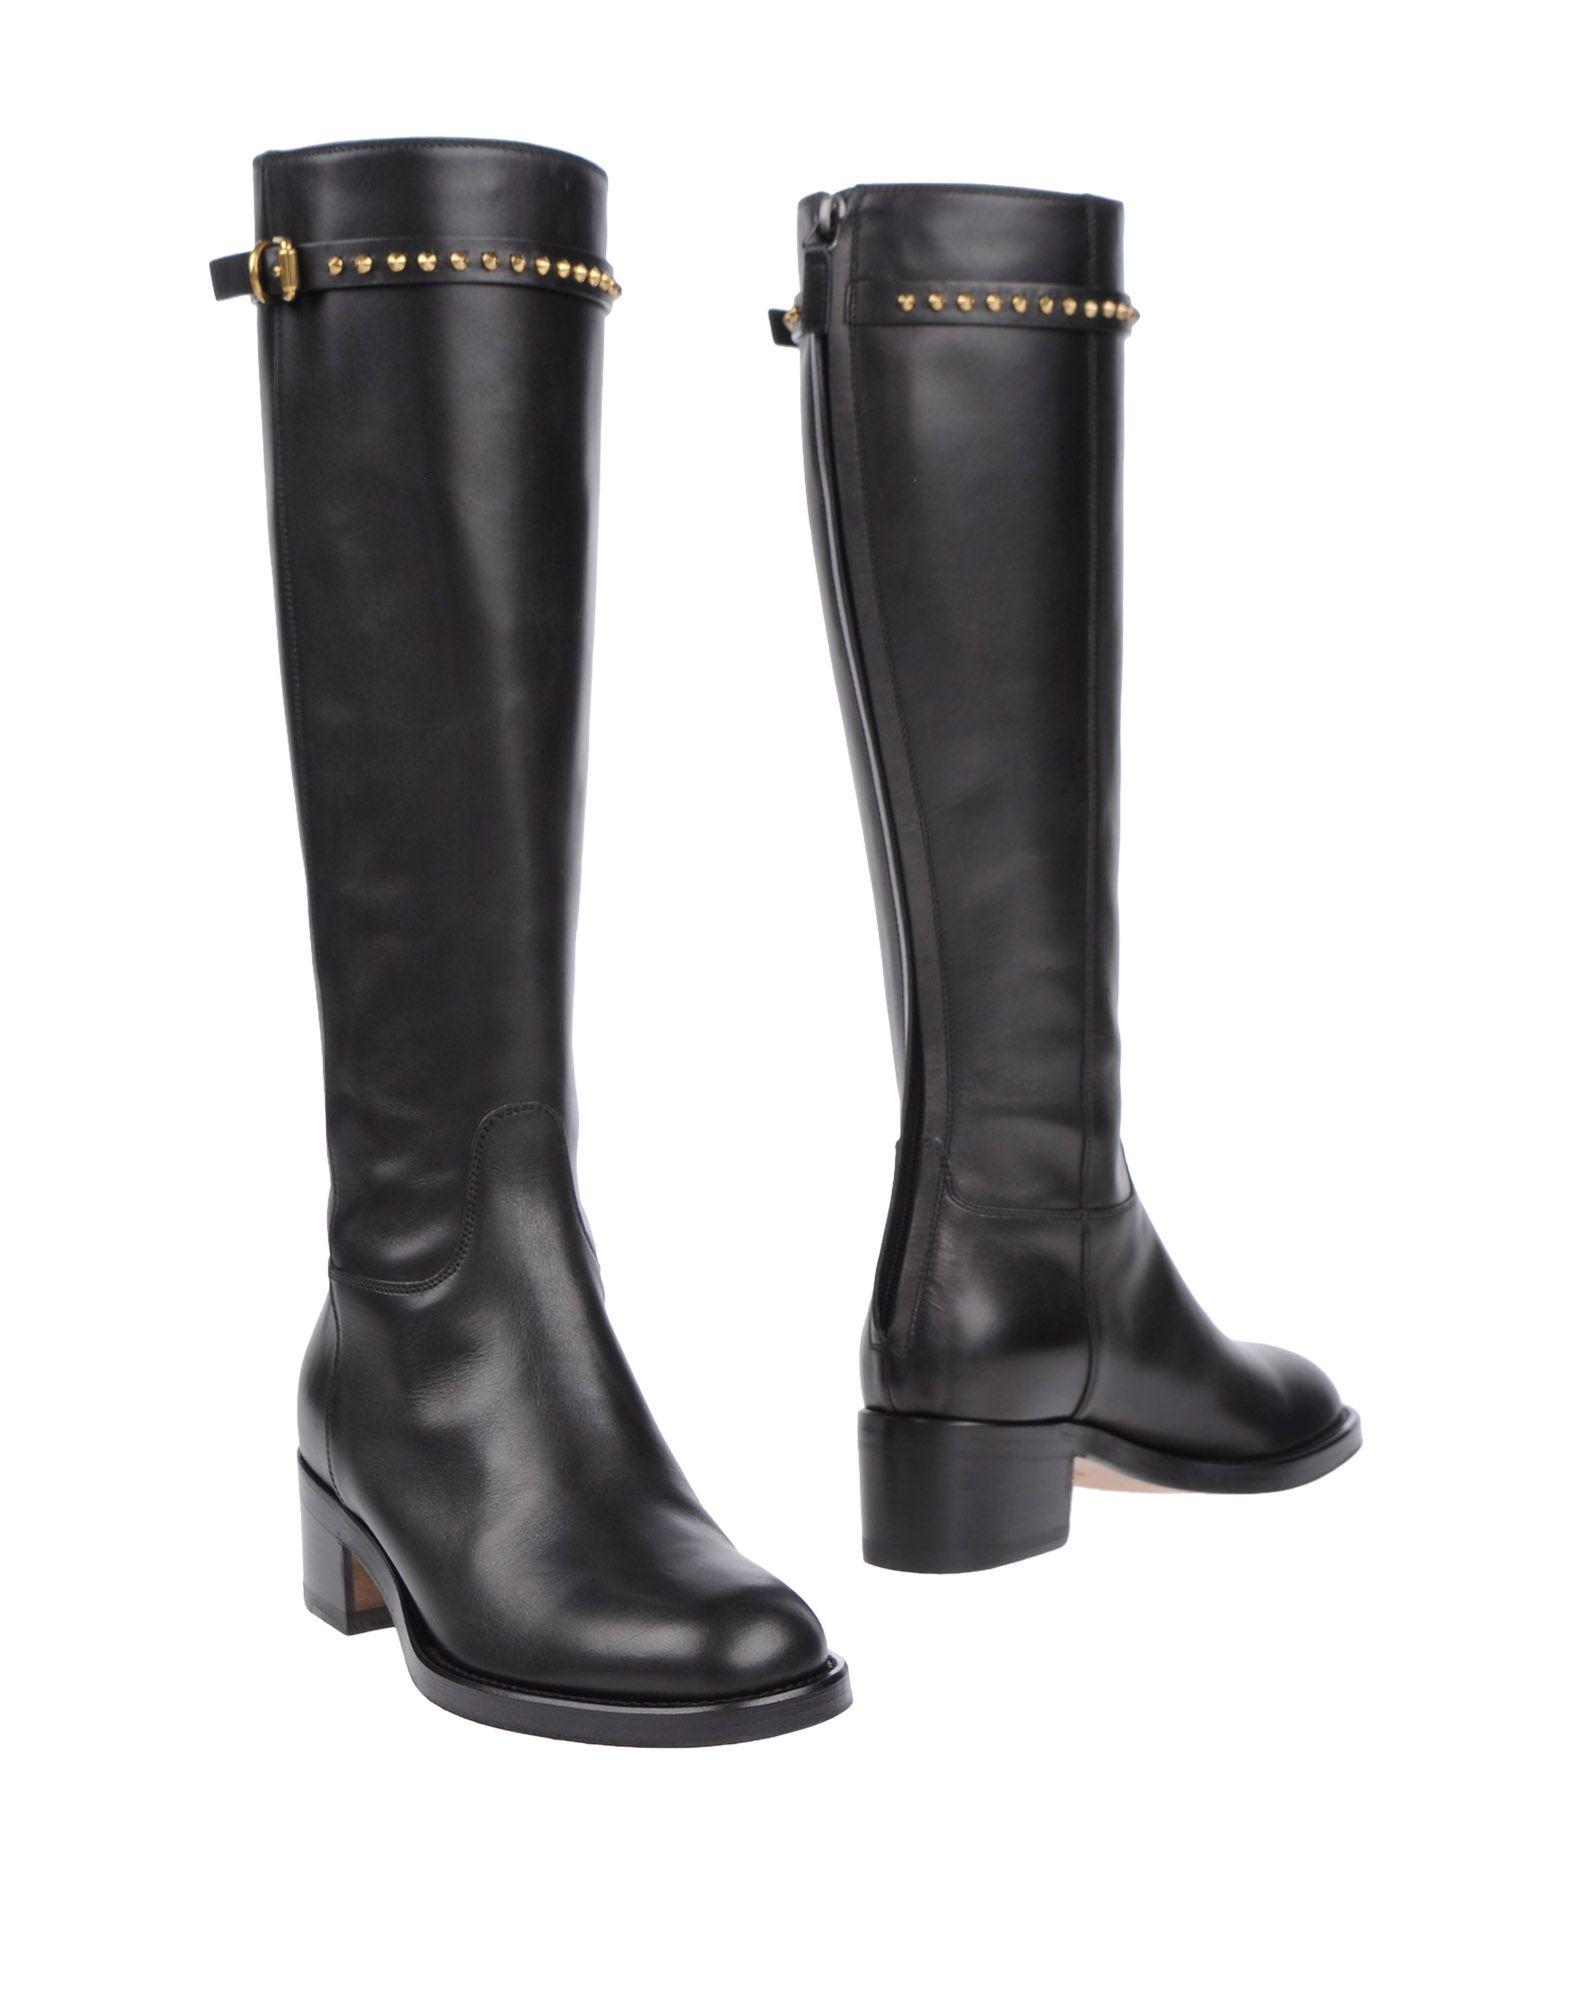 67d1fcdff gucci flat boots for women - Buy best women's gucci flat boots on Cools.com  Shop